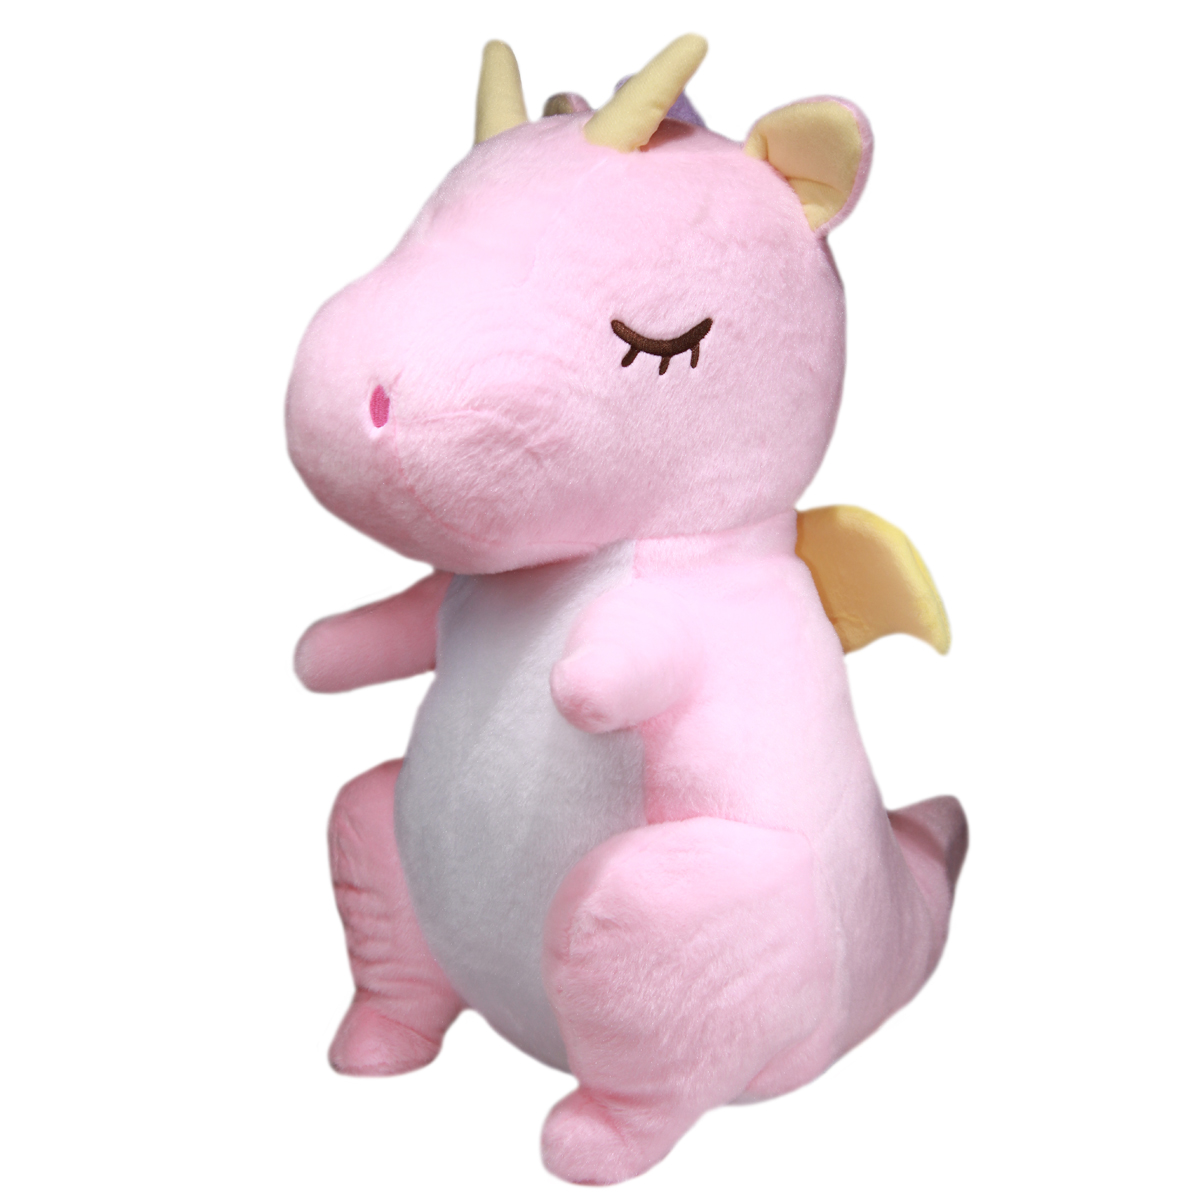 Fantasy Dragon Plushie Soft Stuffed Animal Toy Pink BIG Size 18 Inches